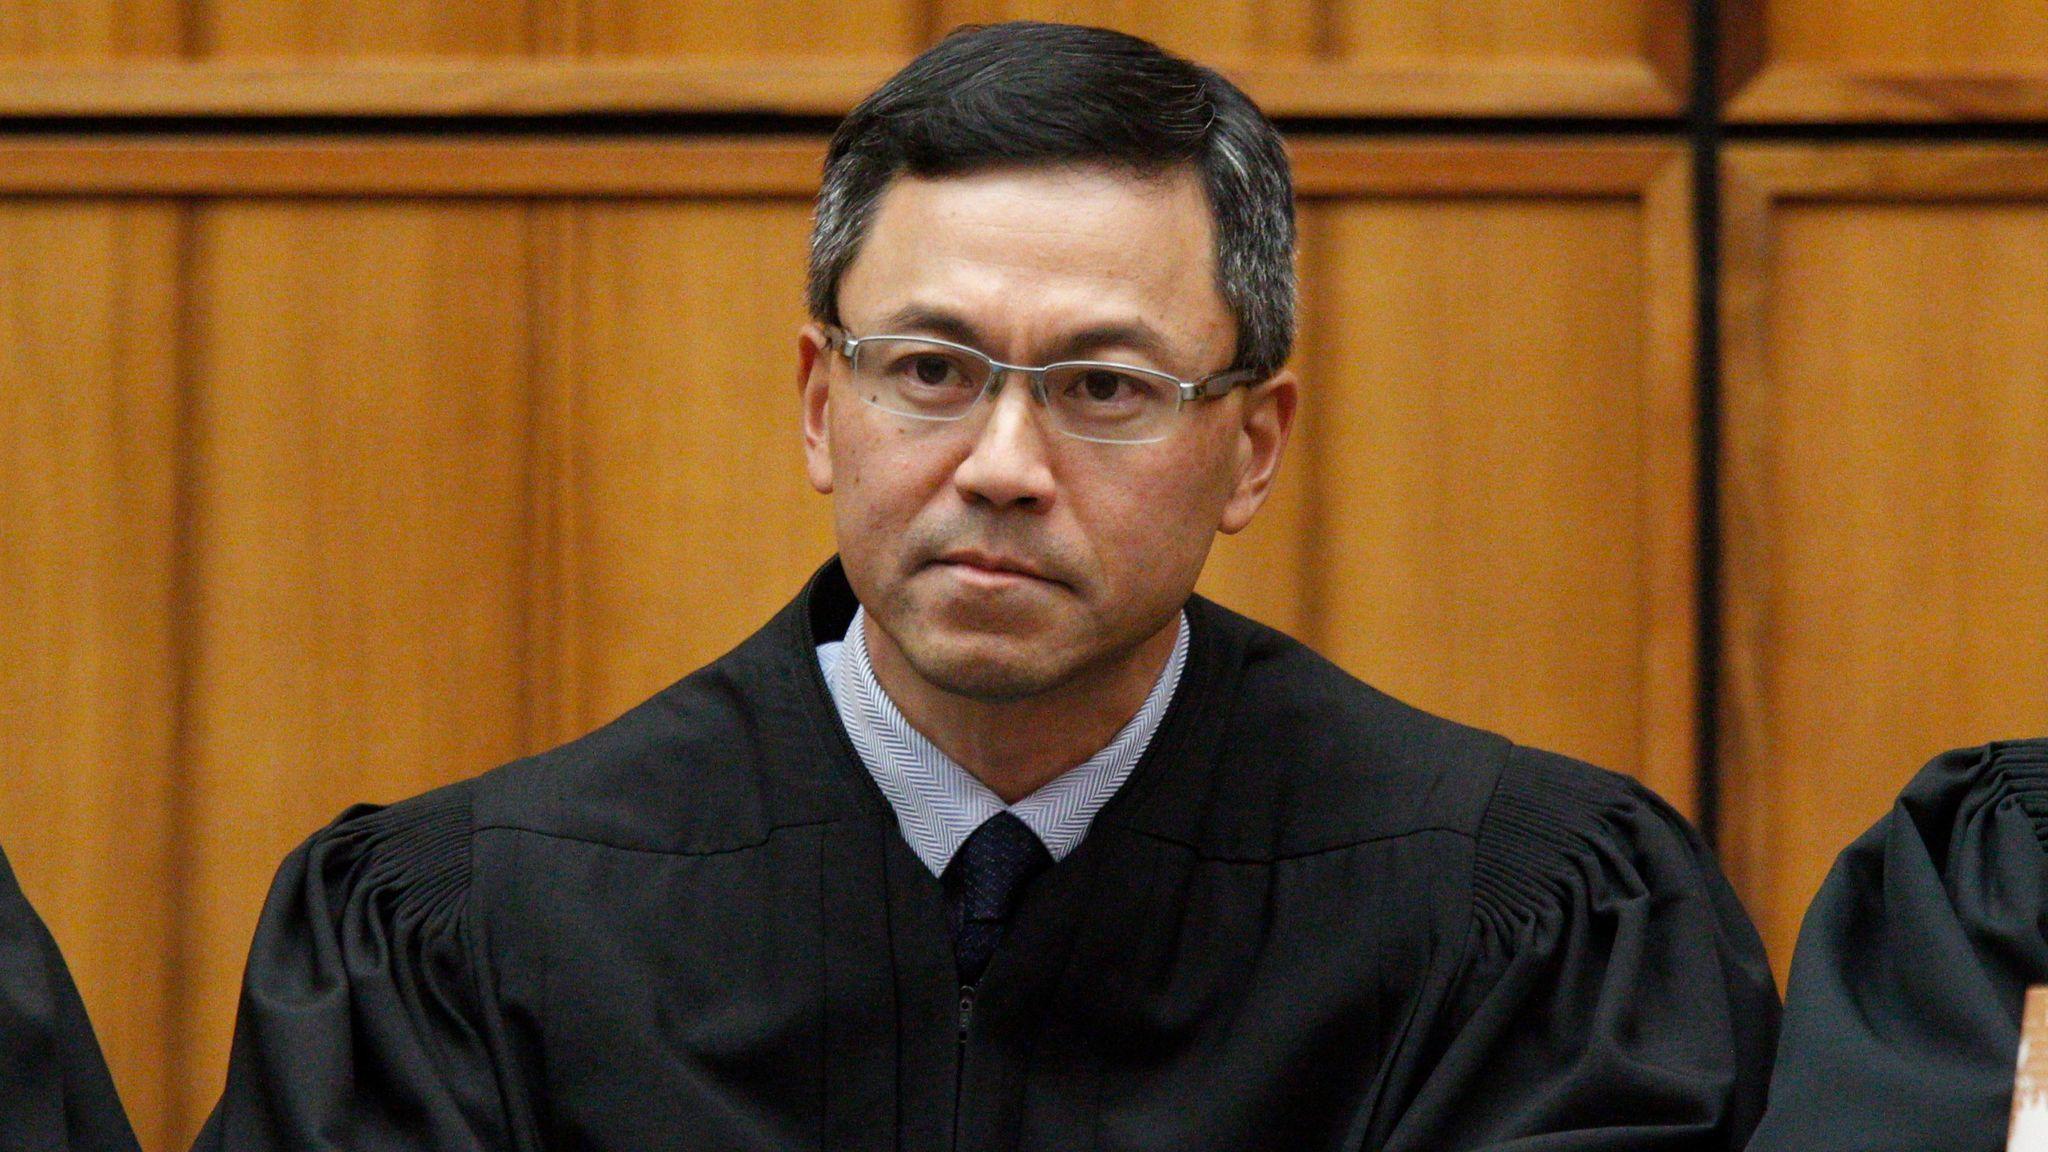 A December 2015 file photo shows U.S. District Judge Derrick Watson in Honolulu.